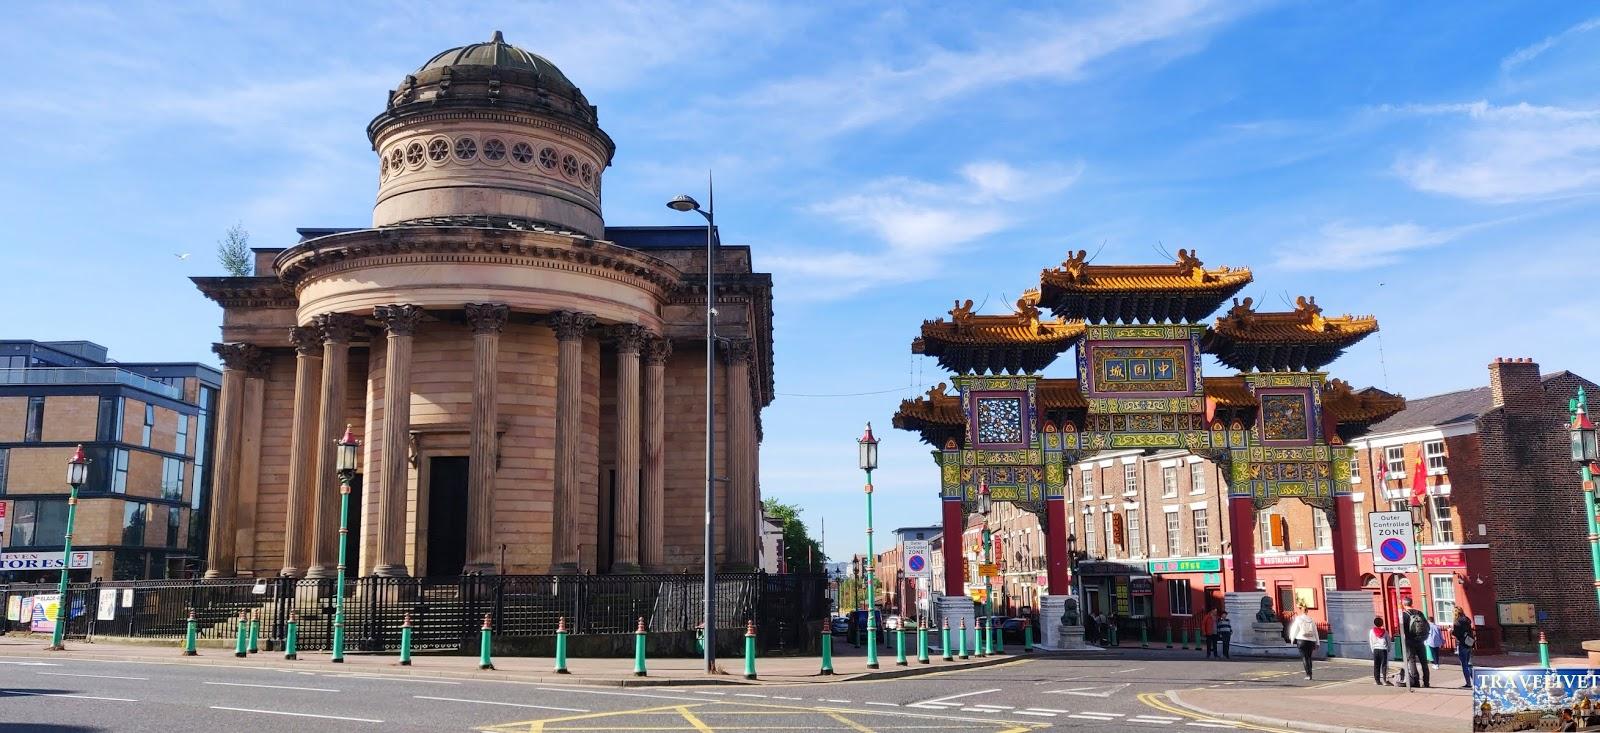 Angleterre Liverpool ChinaTown